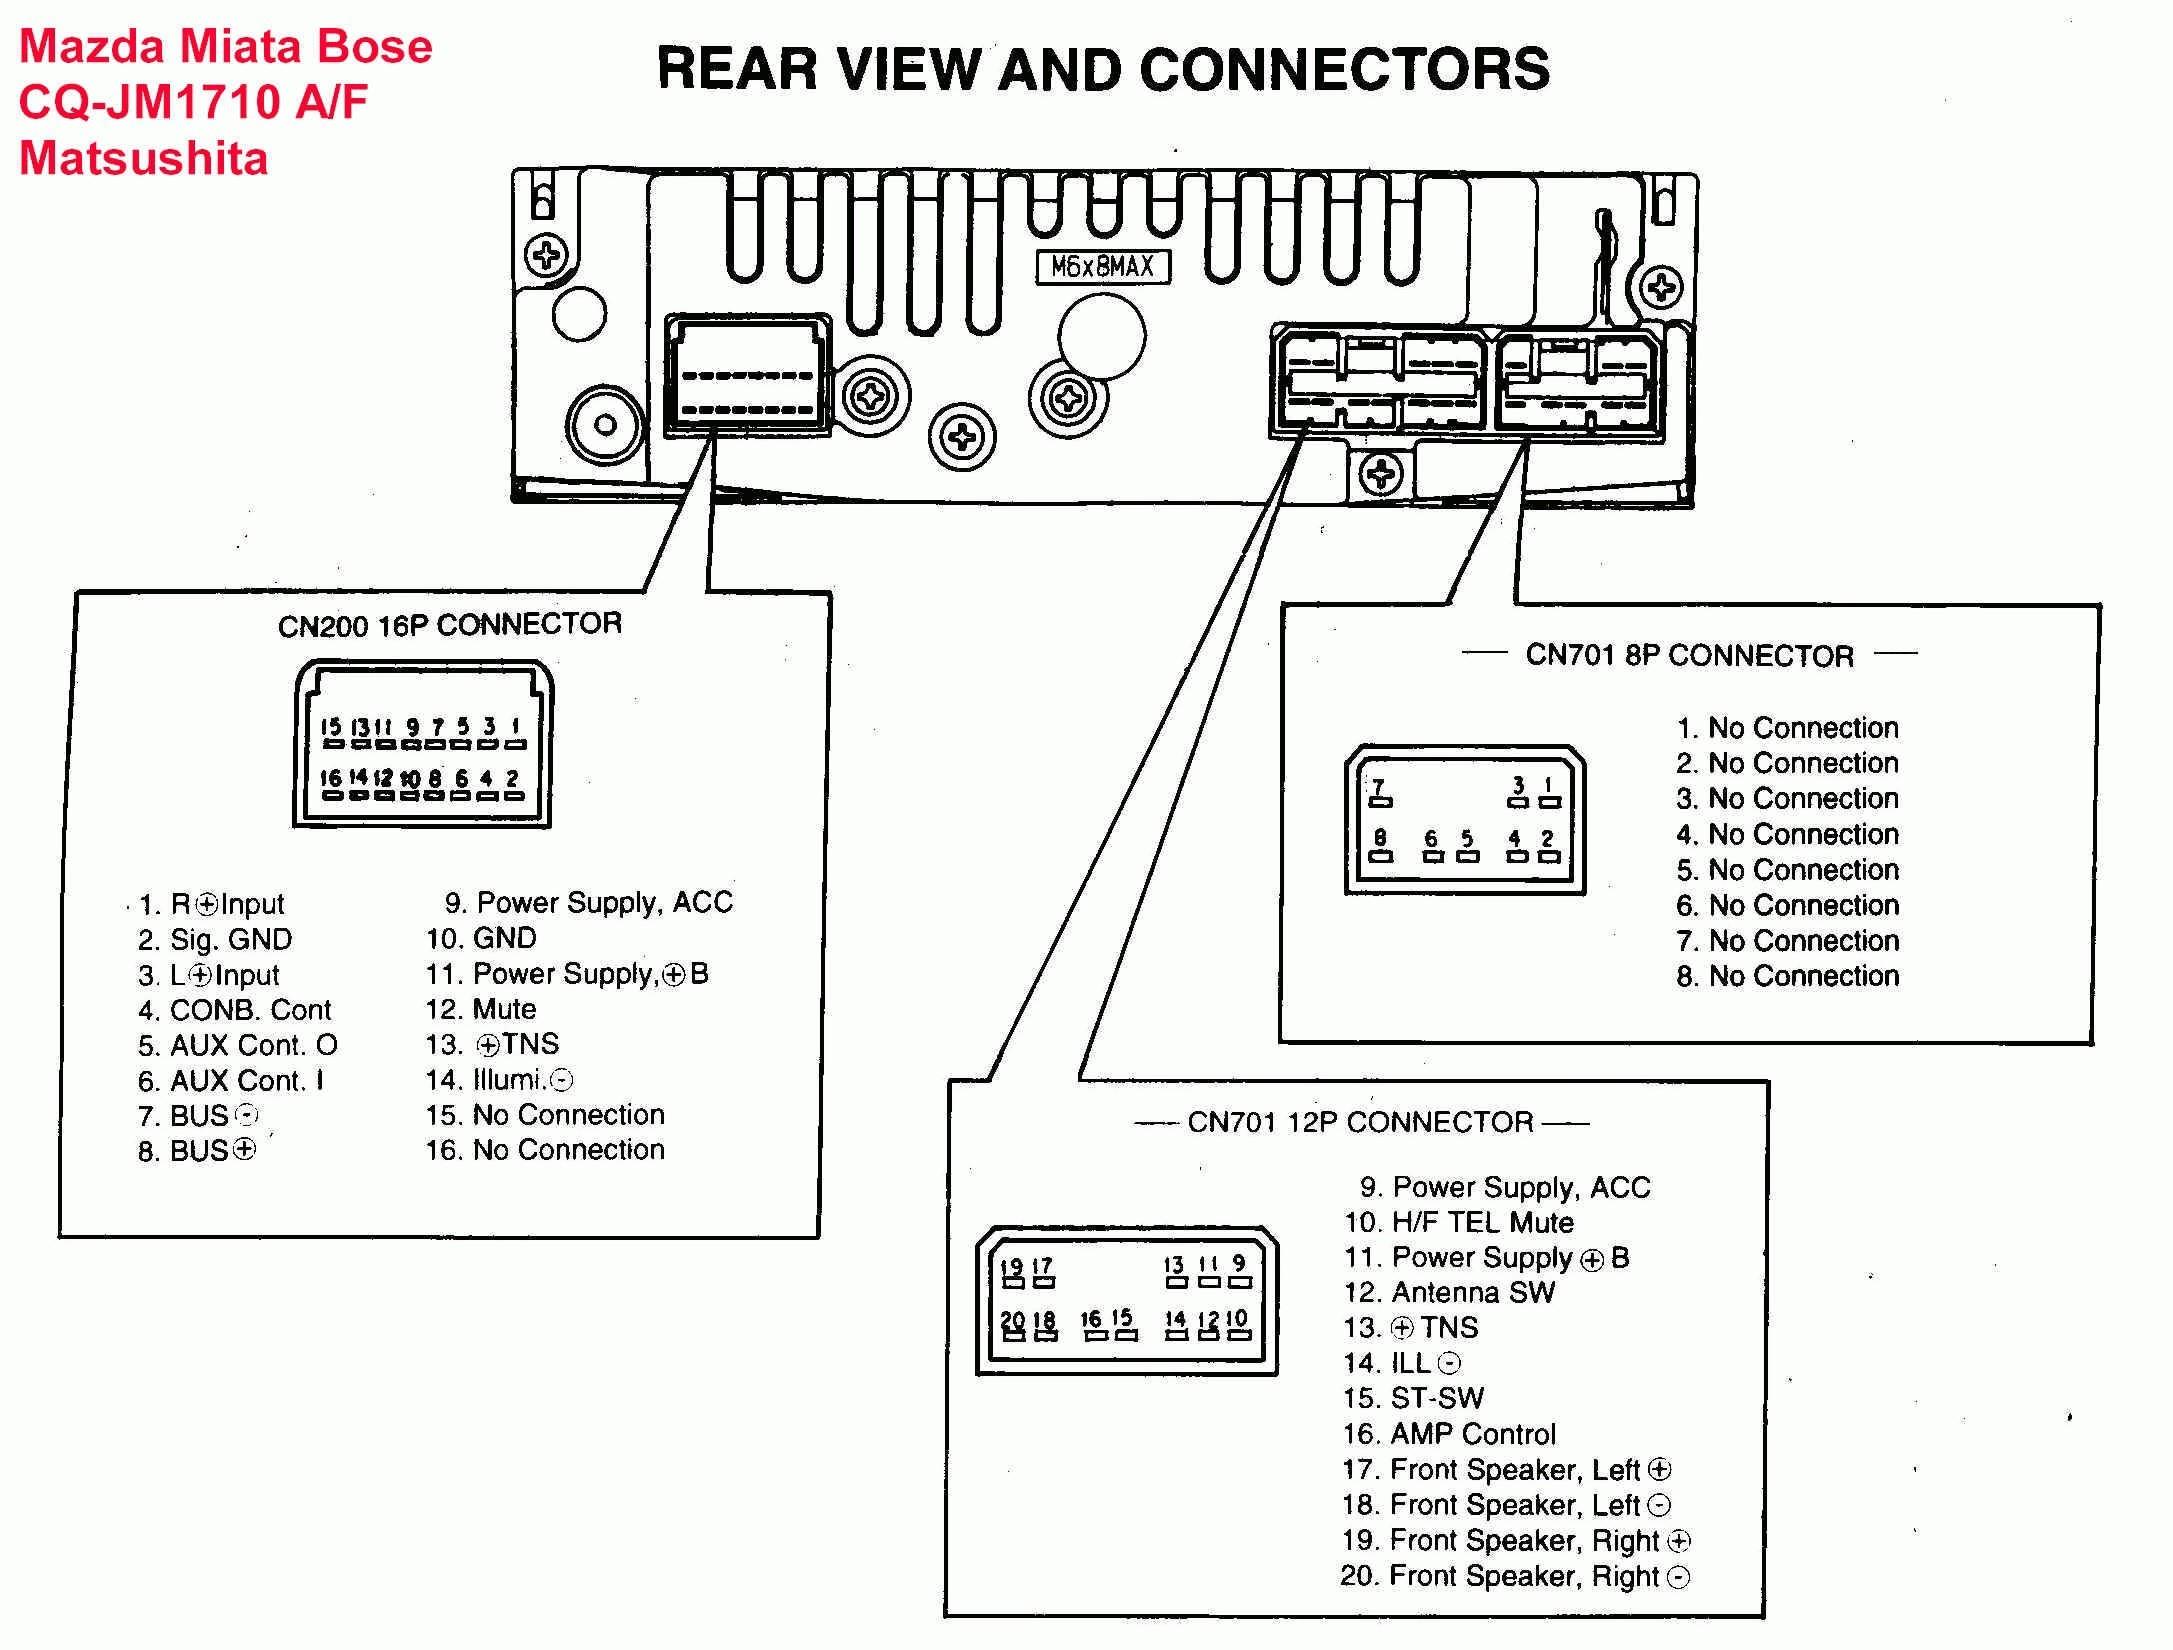 fujitsu ten pinout elegant toyota wiring diagram of fujitsu ten pinout